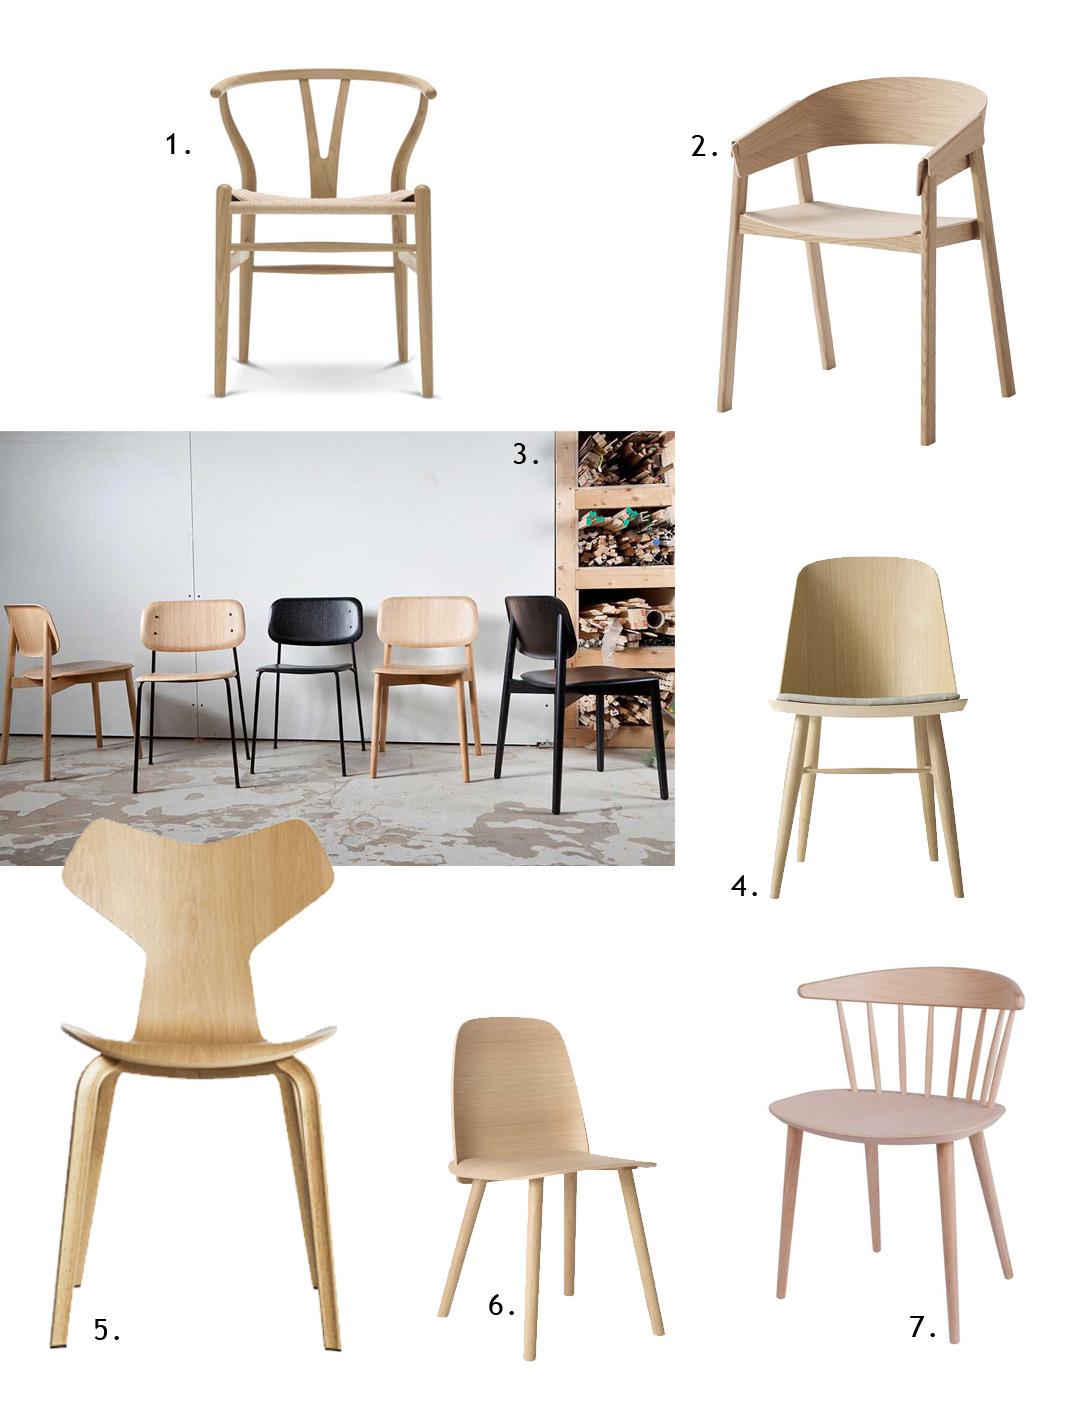 7 Wooden designer chairs, Wegner, wishbone, muuto, hay, carl hansen, arne jacobsen